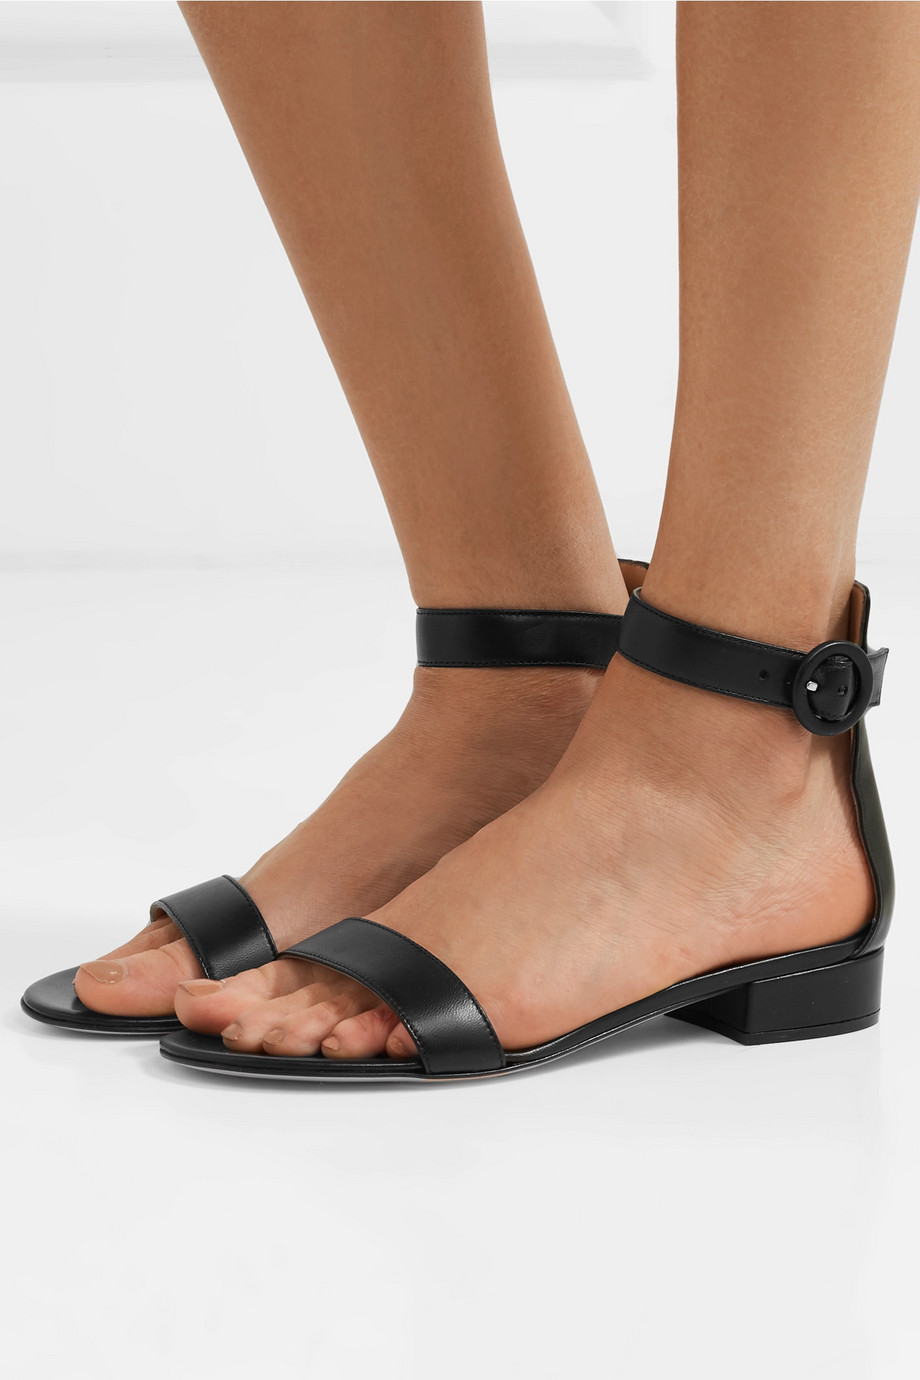 Gianvito Rossi Versilia 20 leather sandals